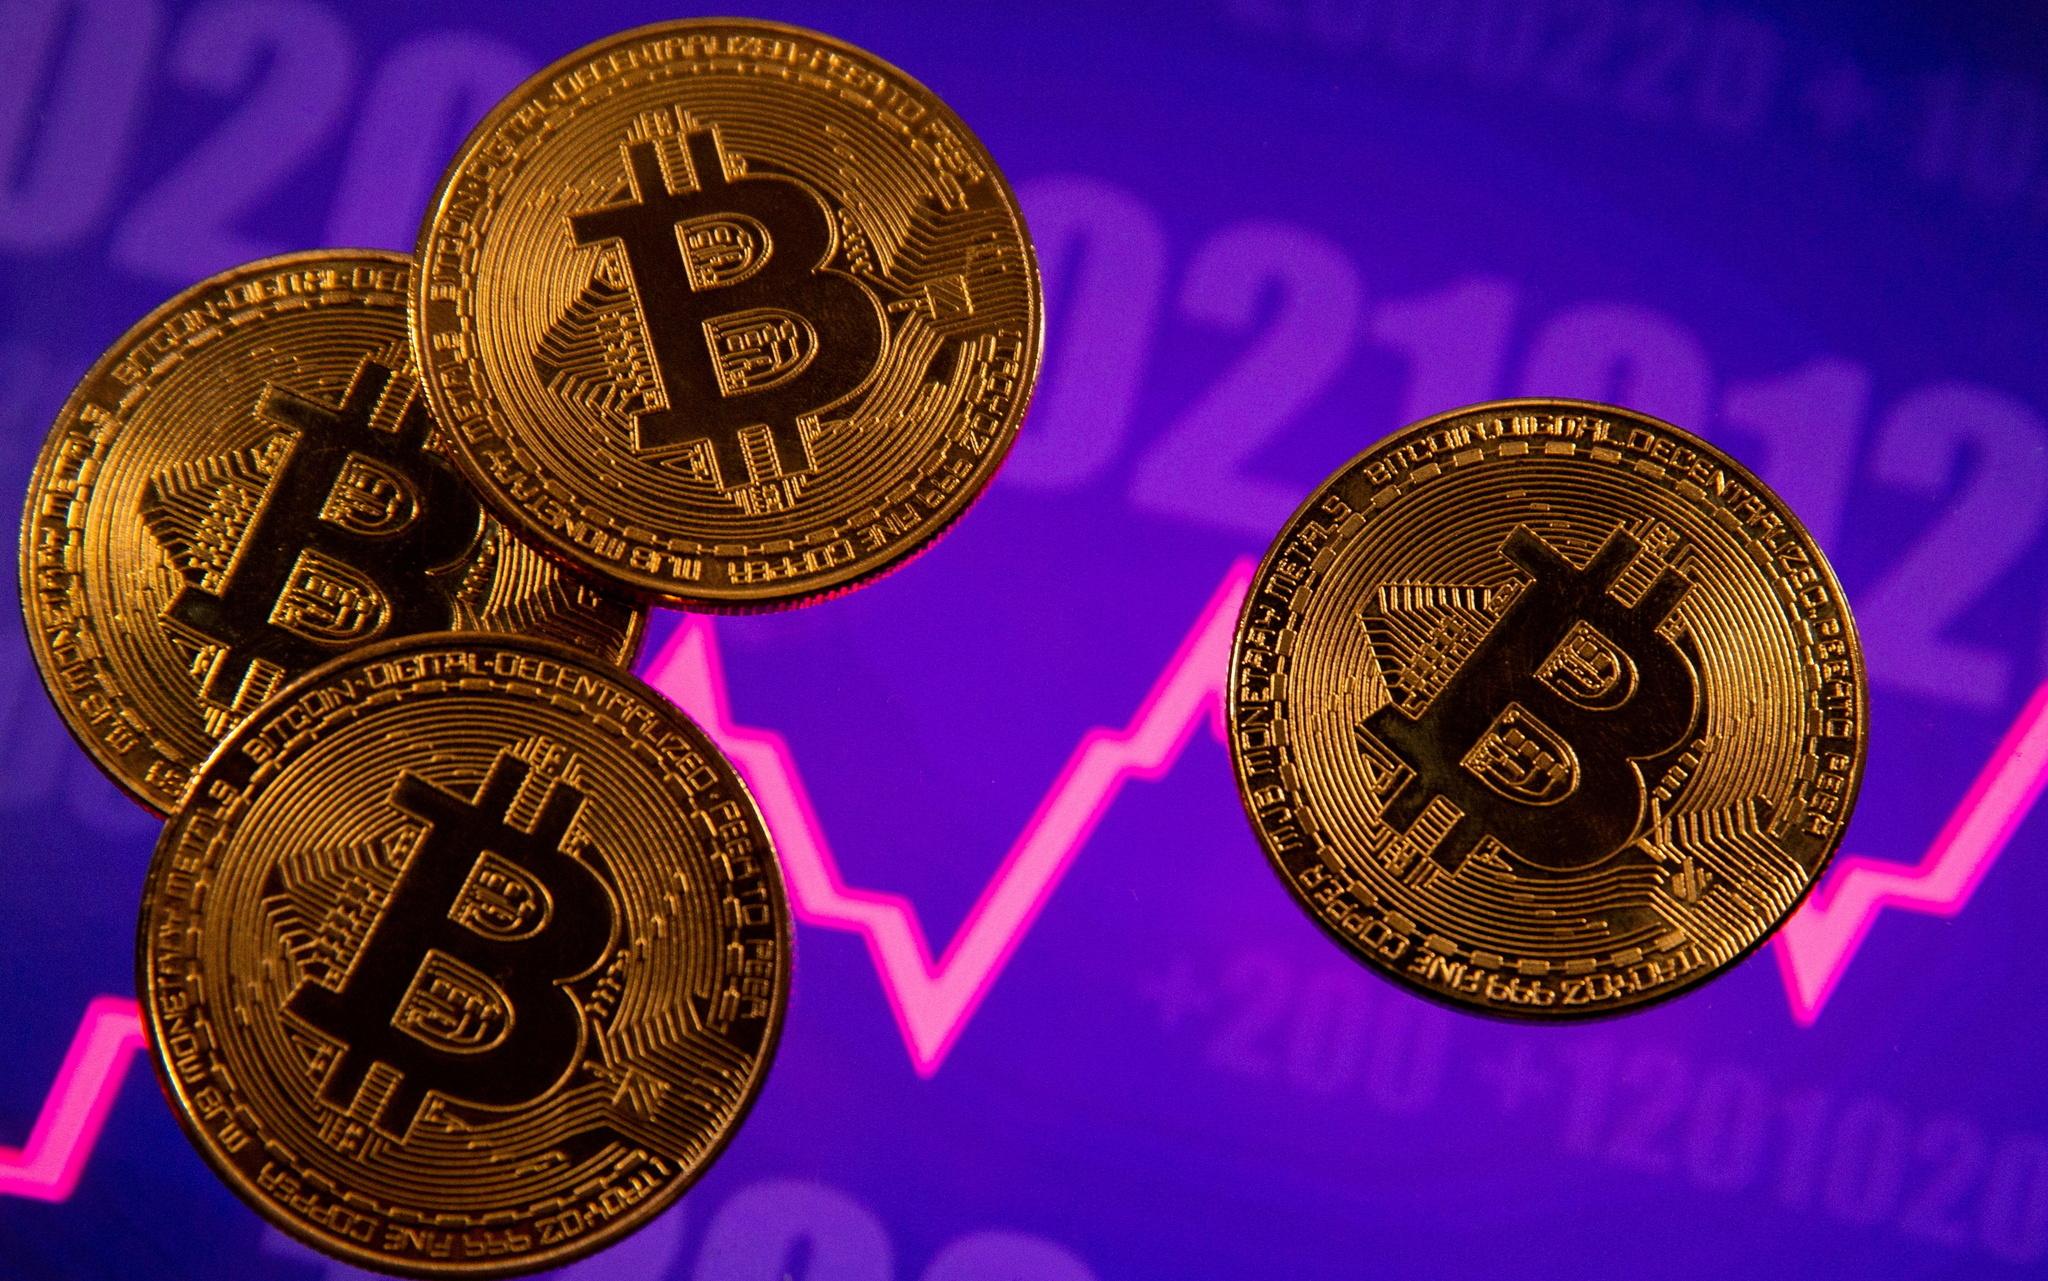 Ist Tesla mehr Bitcoin?